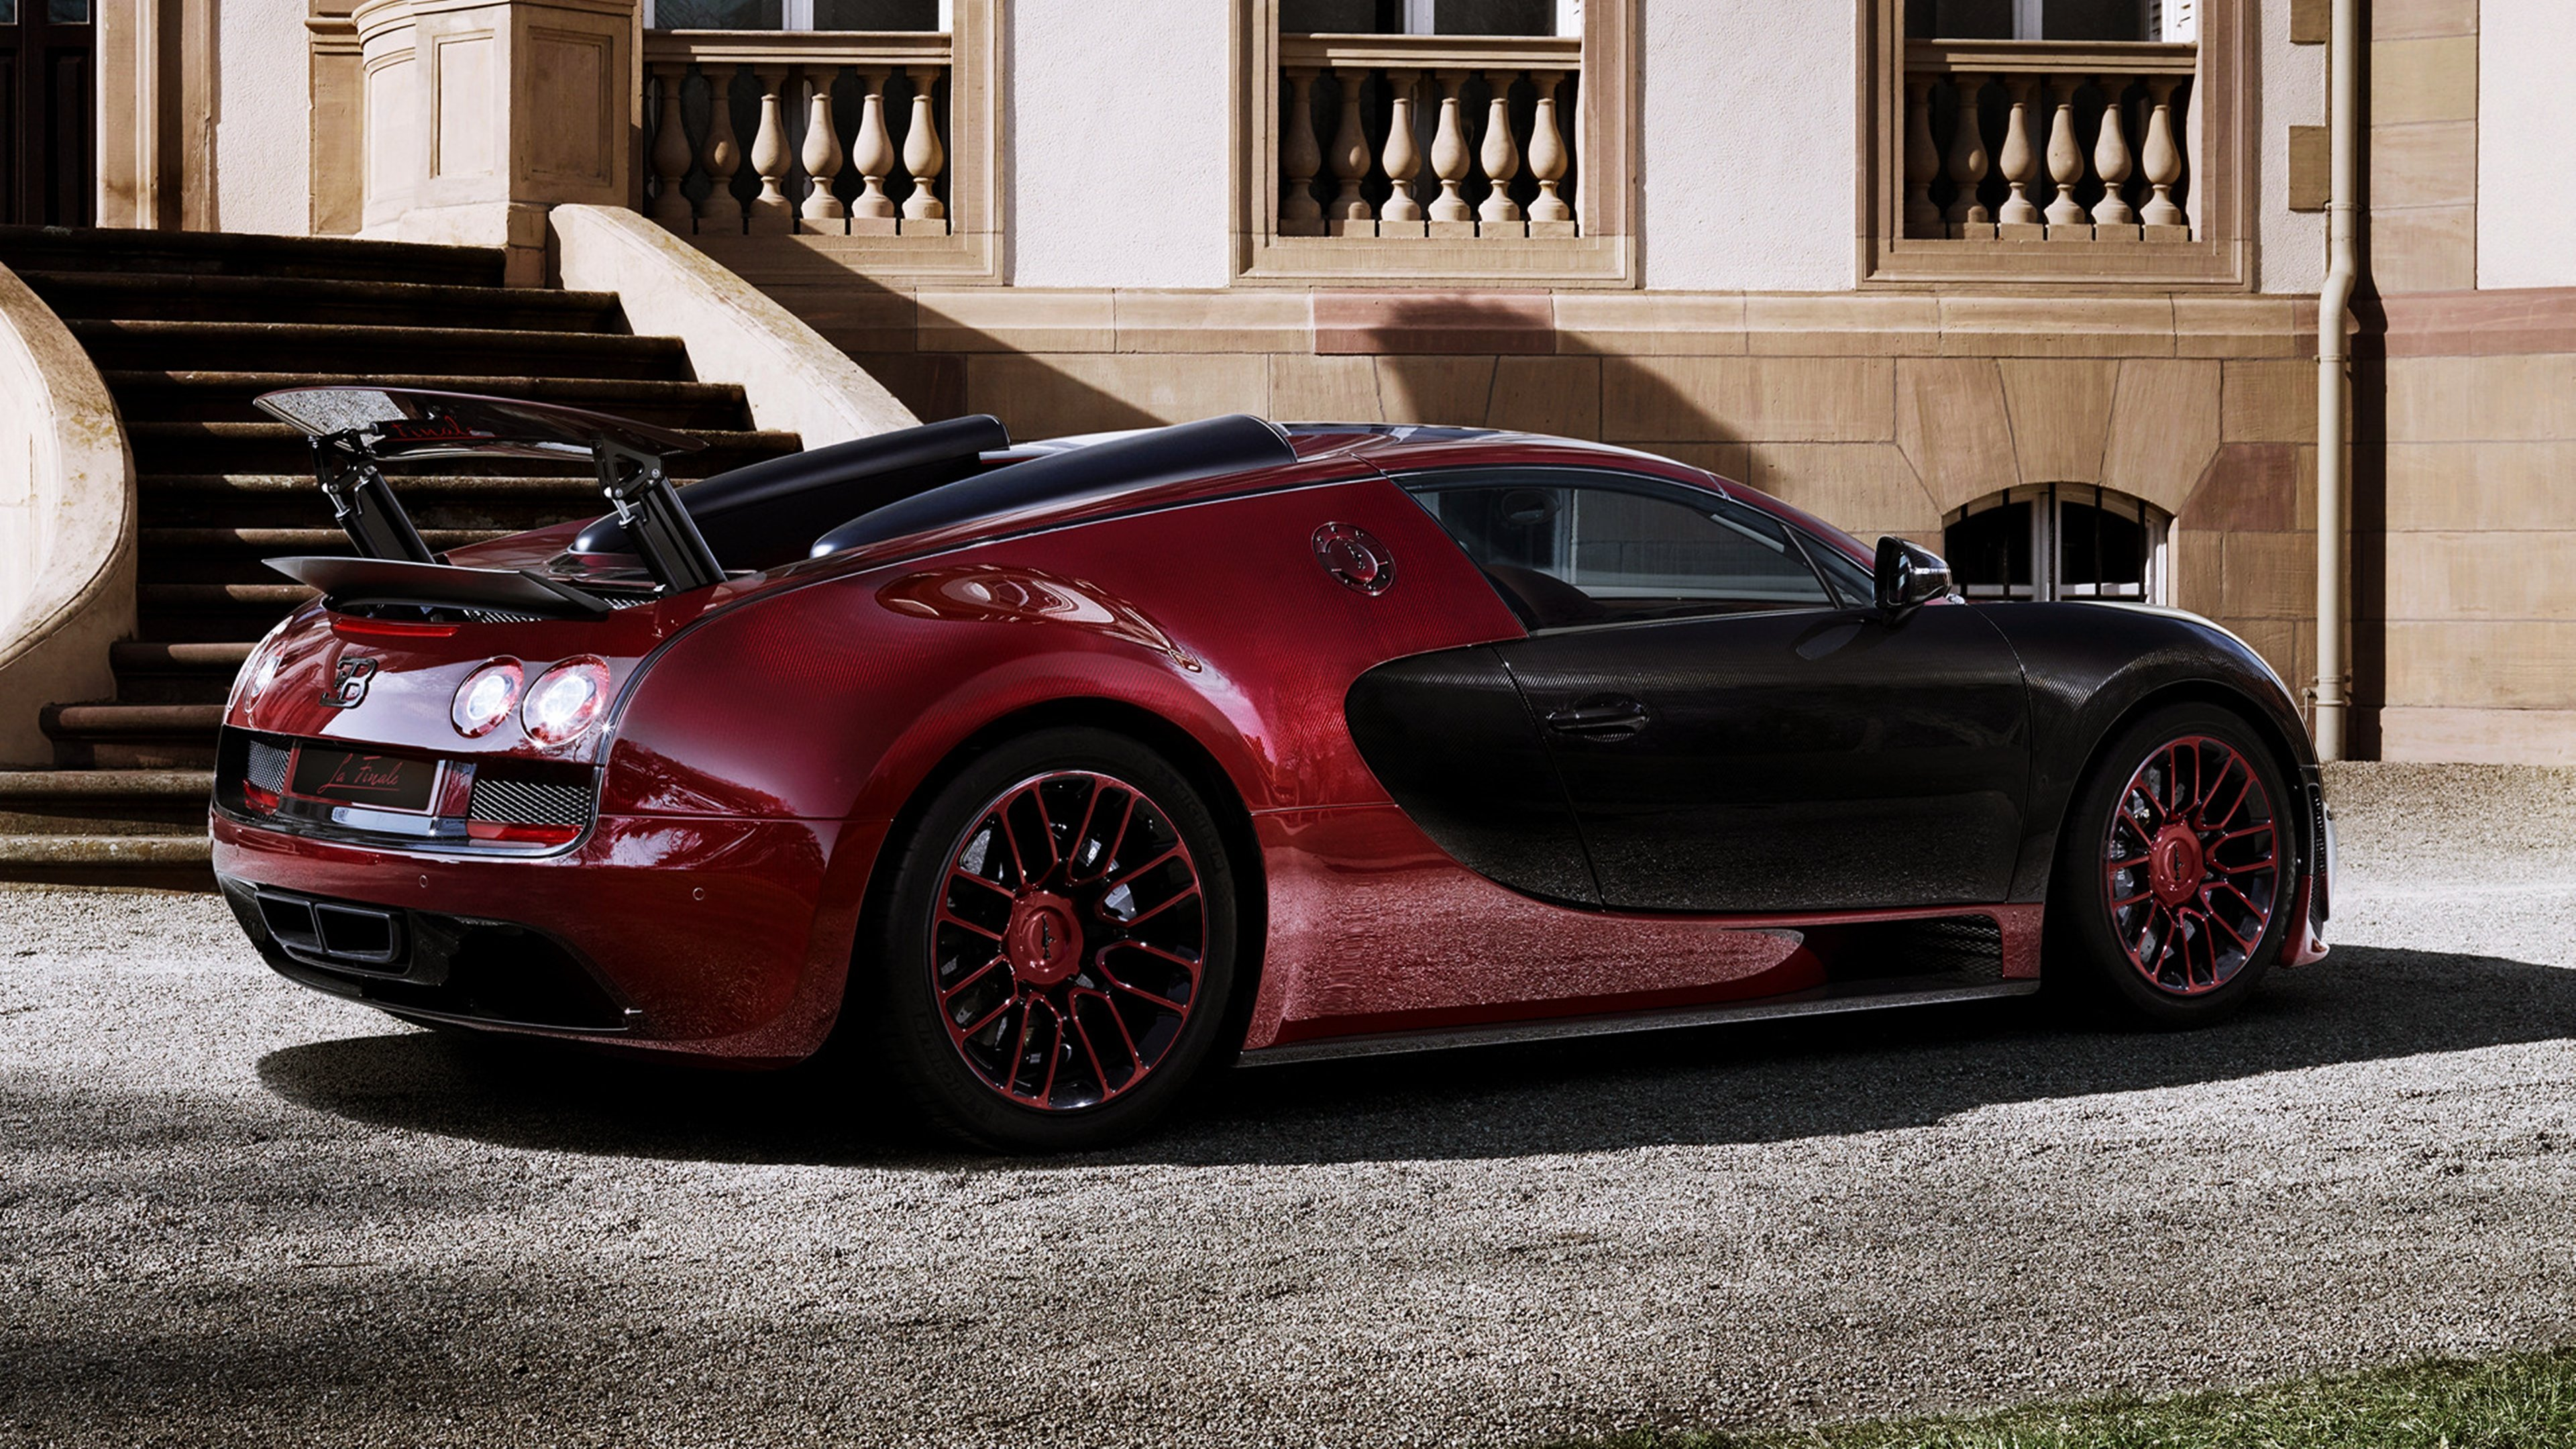 2015 bugatti veyron grand sport vitesse la finale red. Black Bedroom Furniture Sets. Home Design Ideas